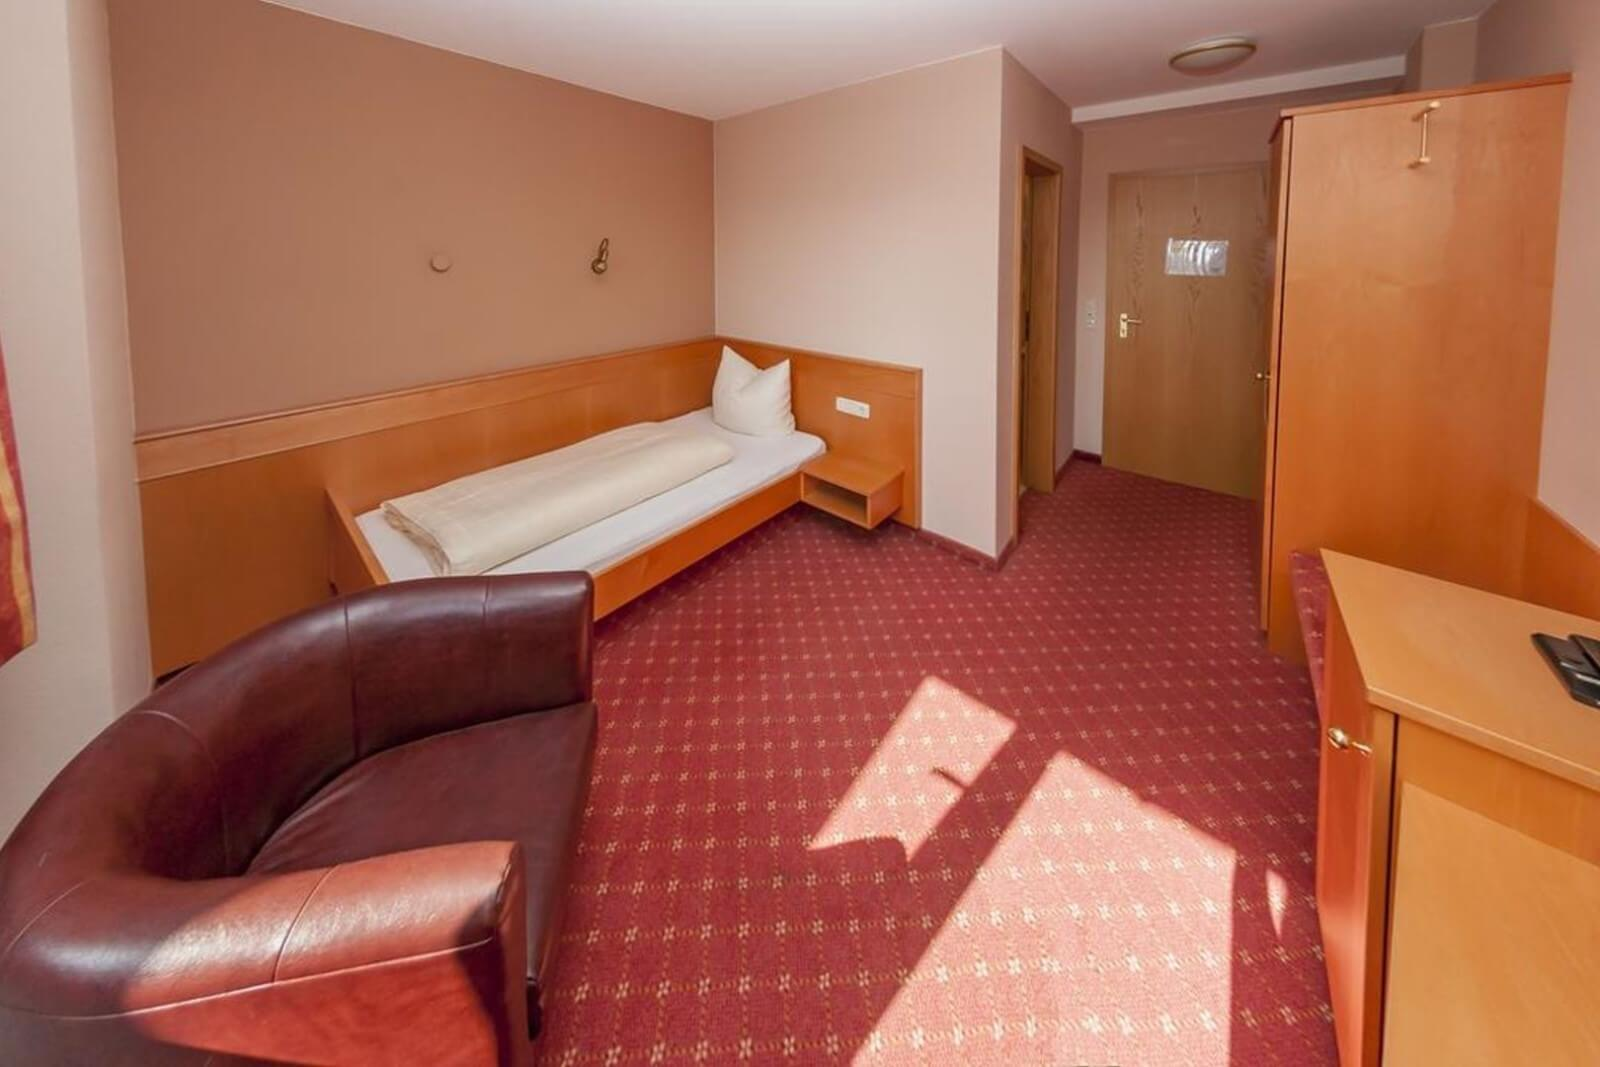 einzelzimmer-standard-hotel-pension-bett-fruehstueck-riedstadt2